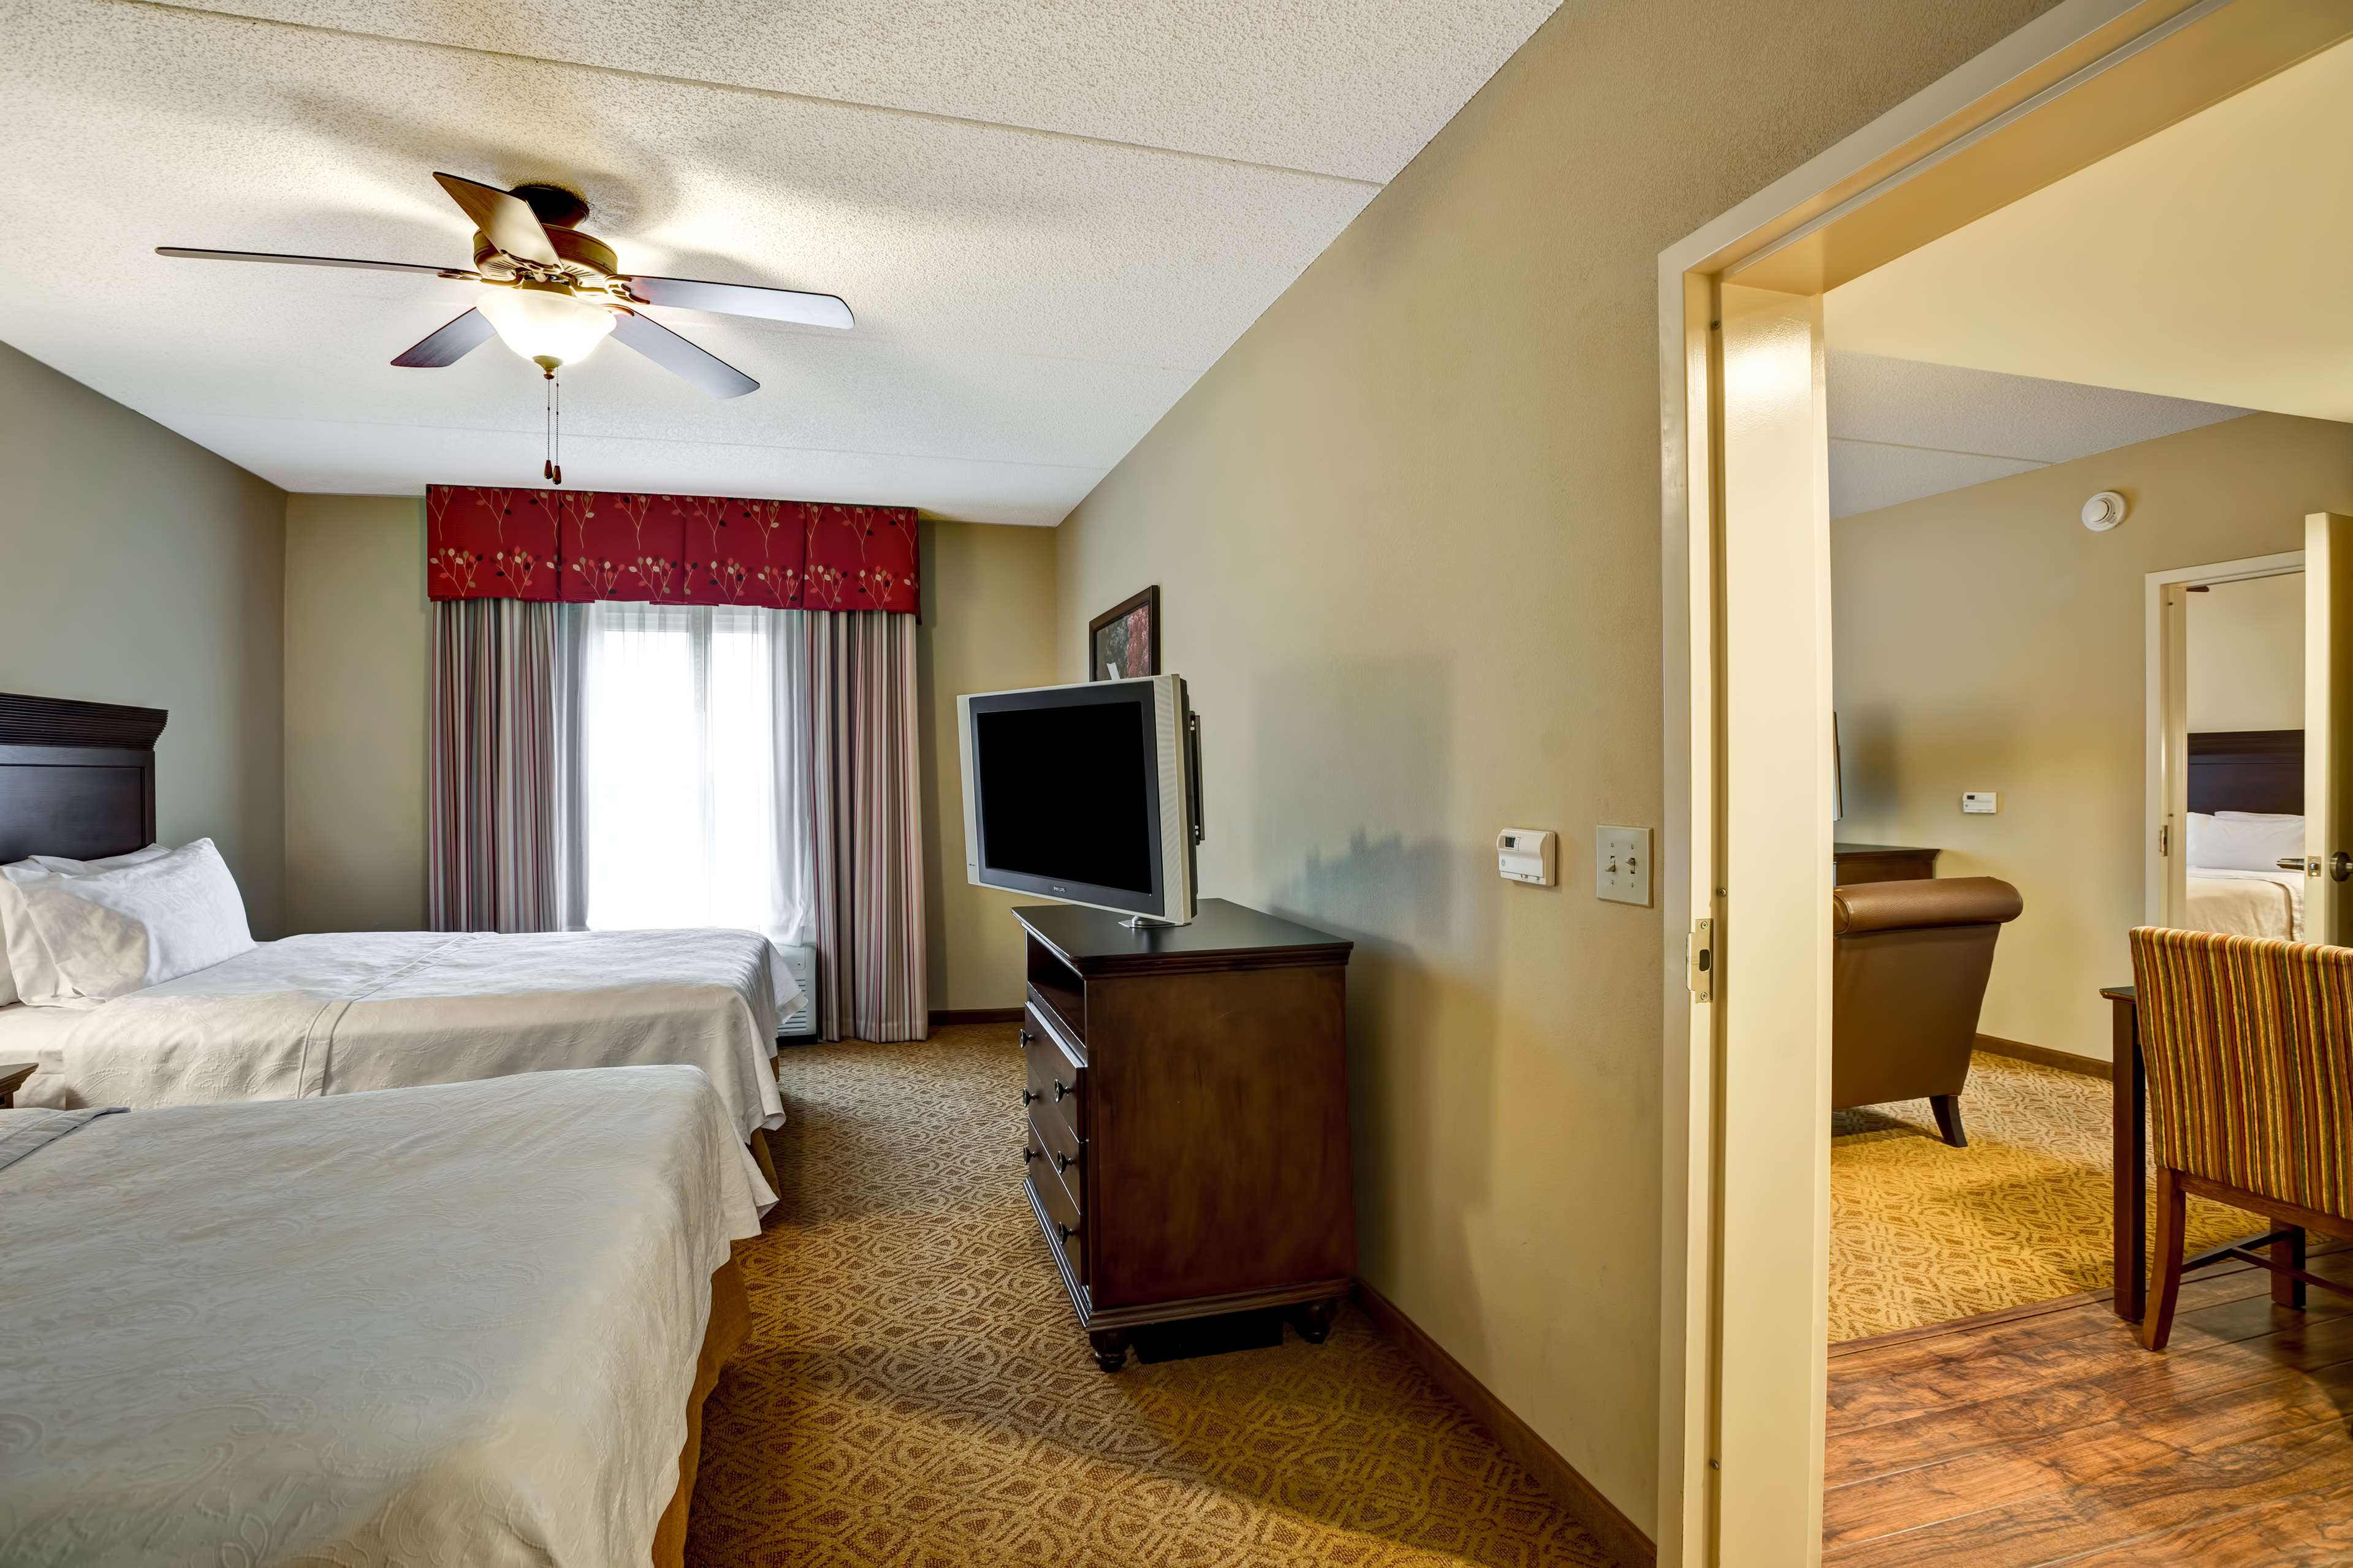 Homewood Suites by Hilton Fredericksburg image 40